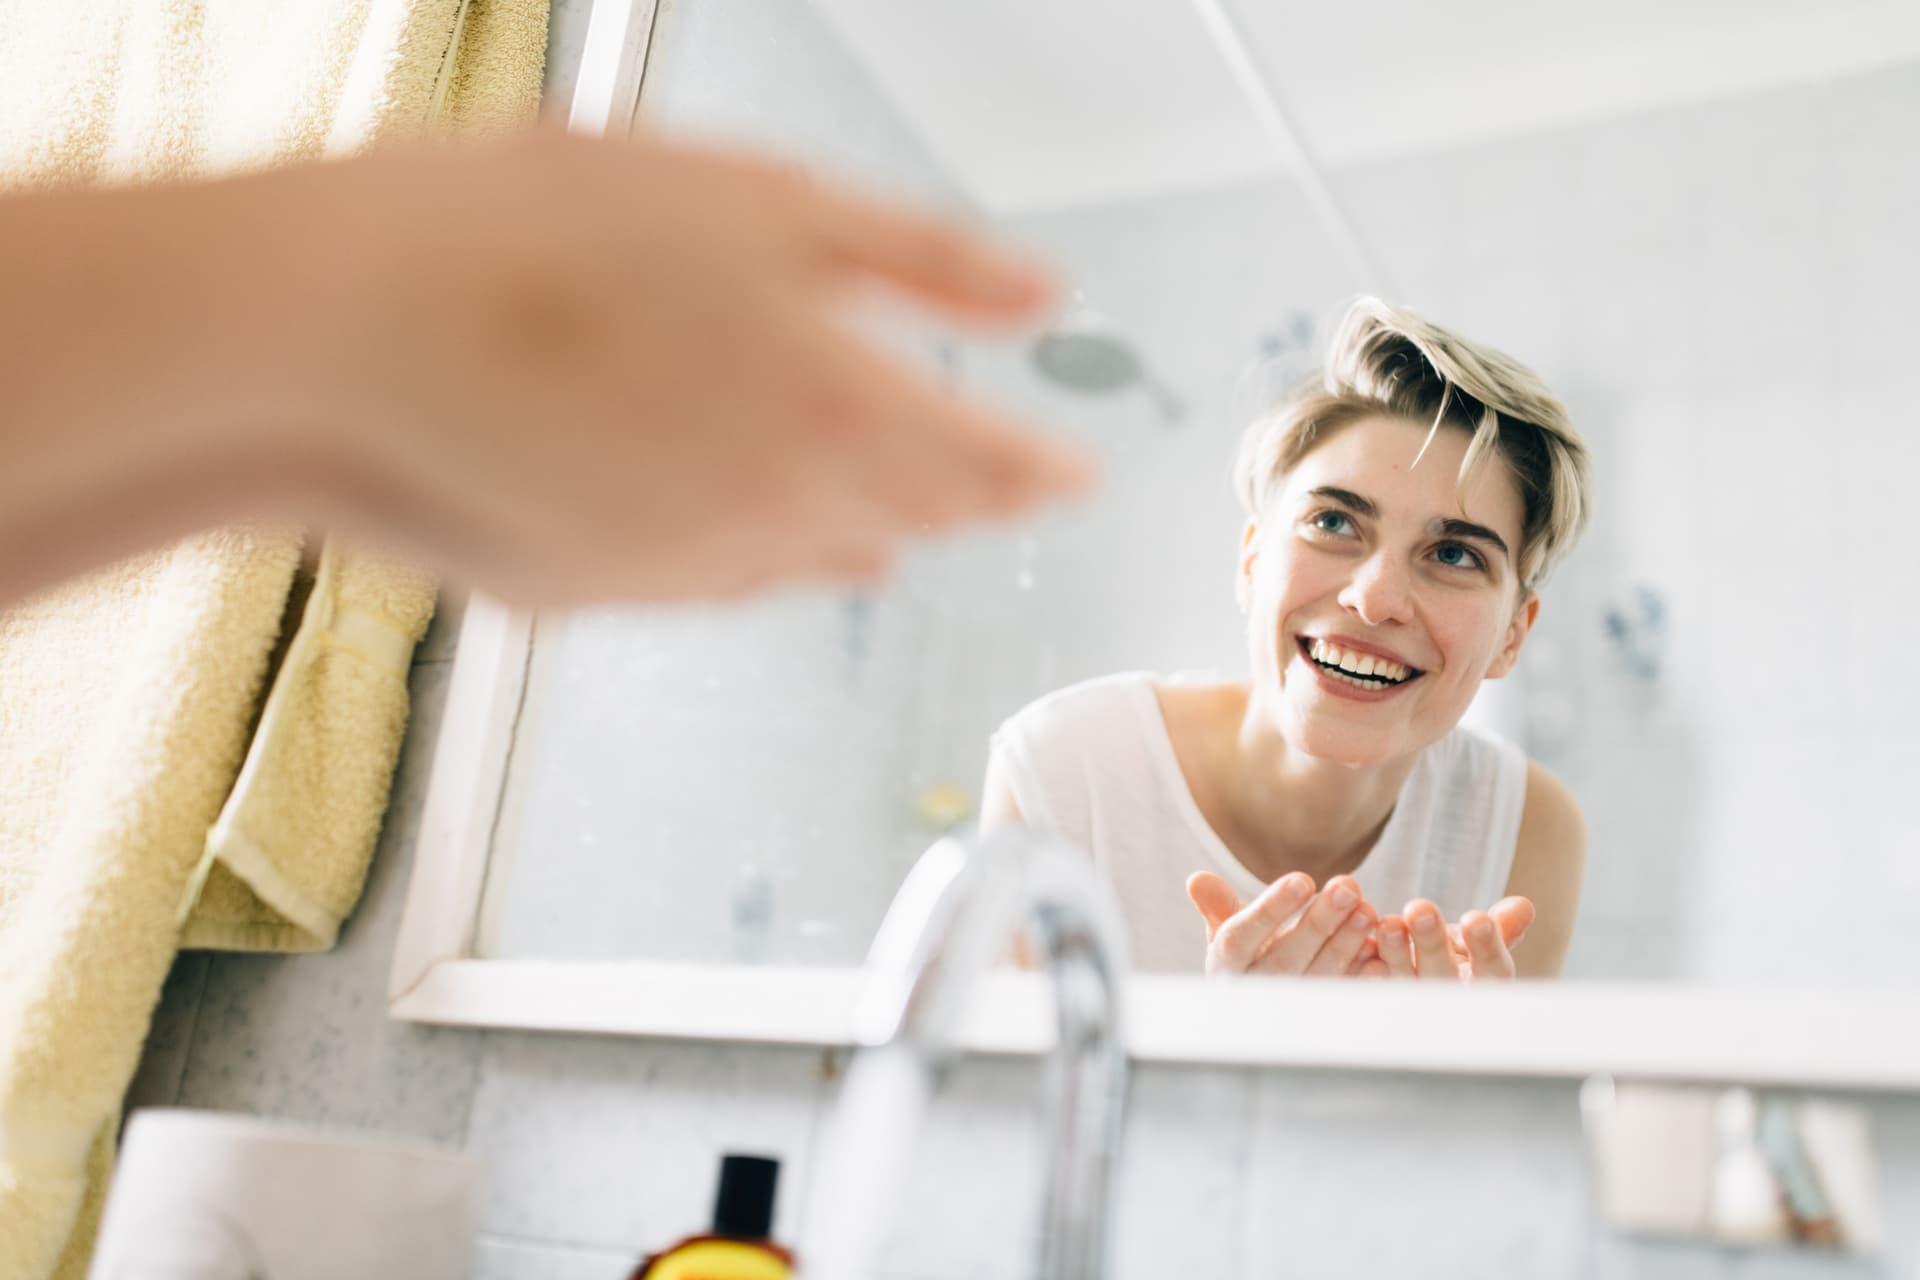 Frau wäscht Gesicht